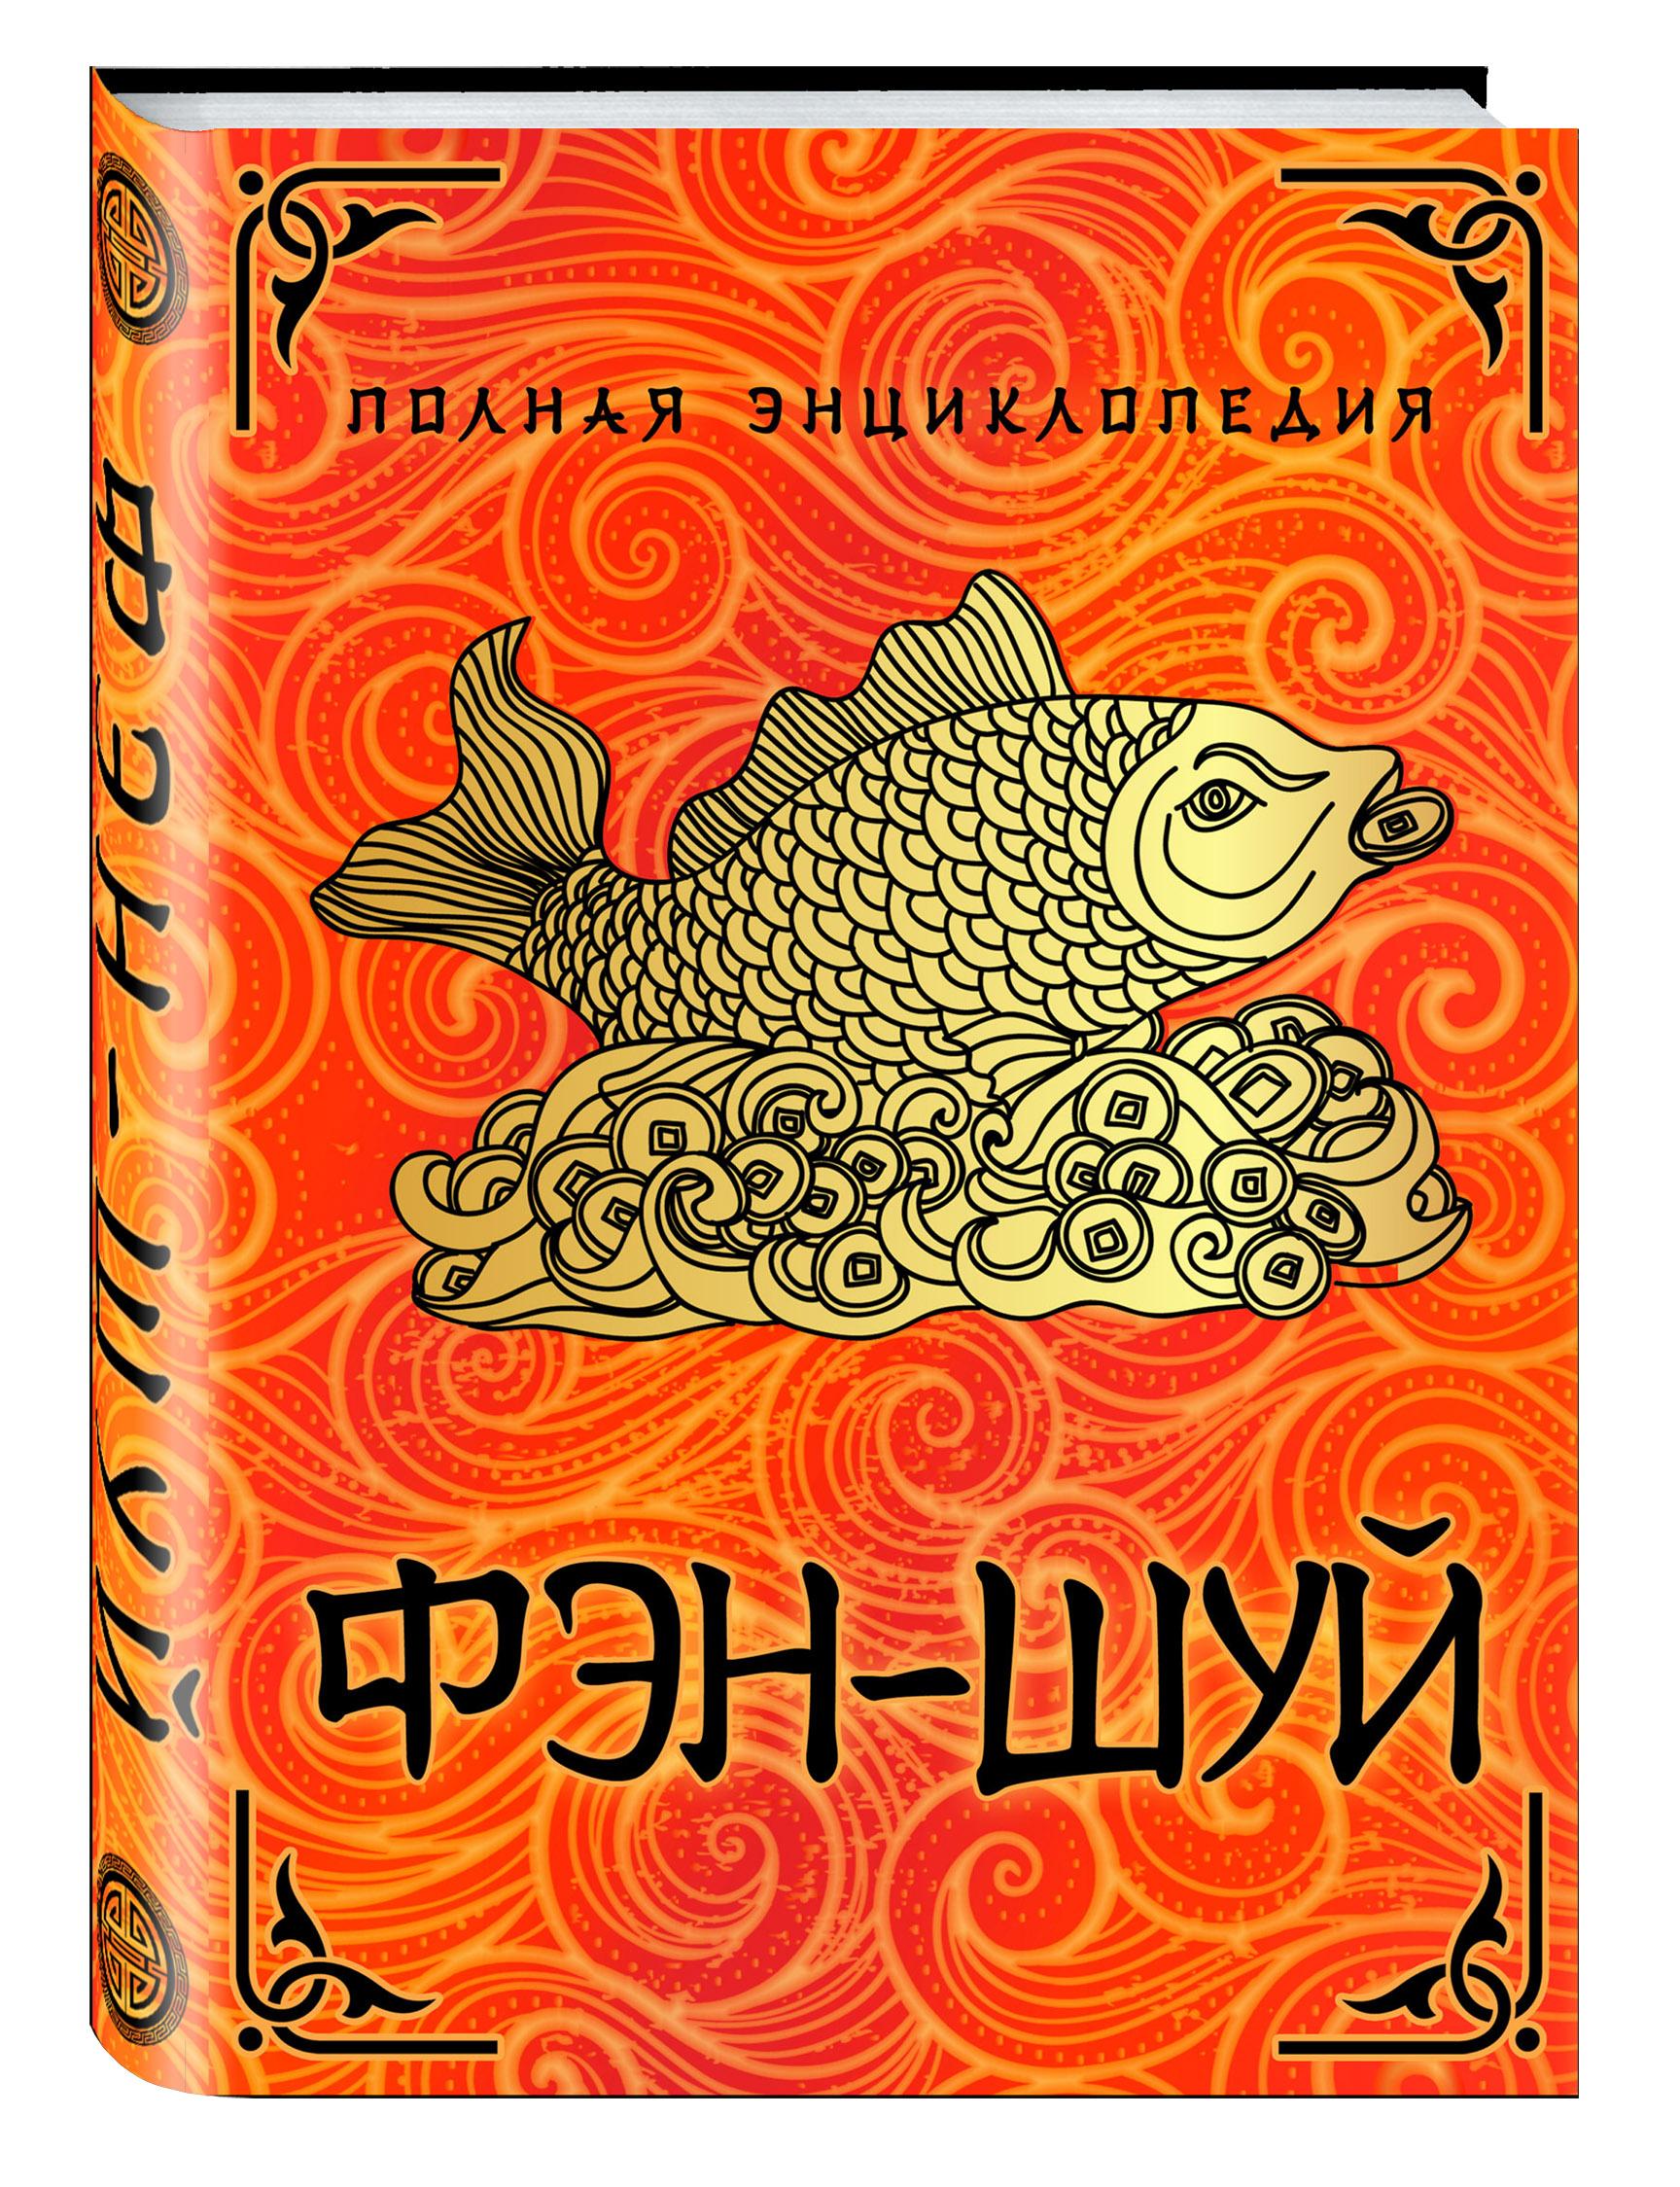 Полная энциклопедия Фэн-Шуй (суперобложка) костенко а тигр астропрогноз и фэн шуй на 2011 год